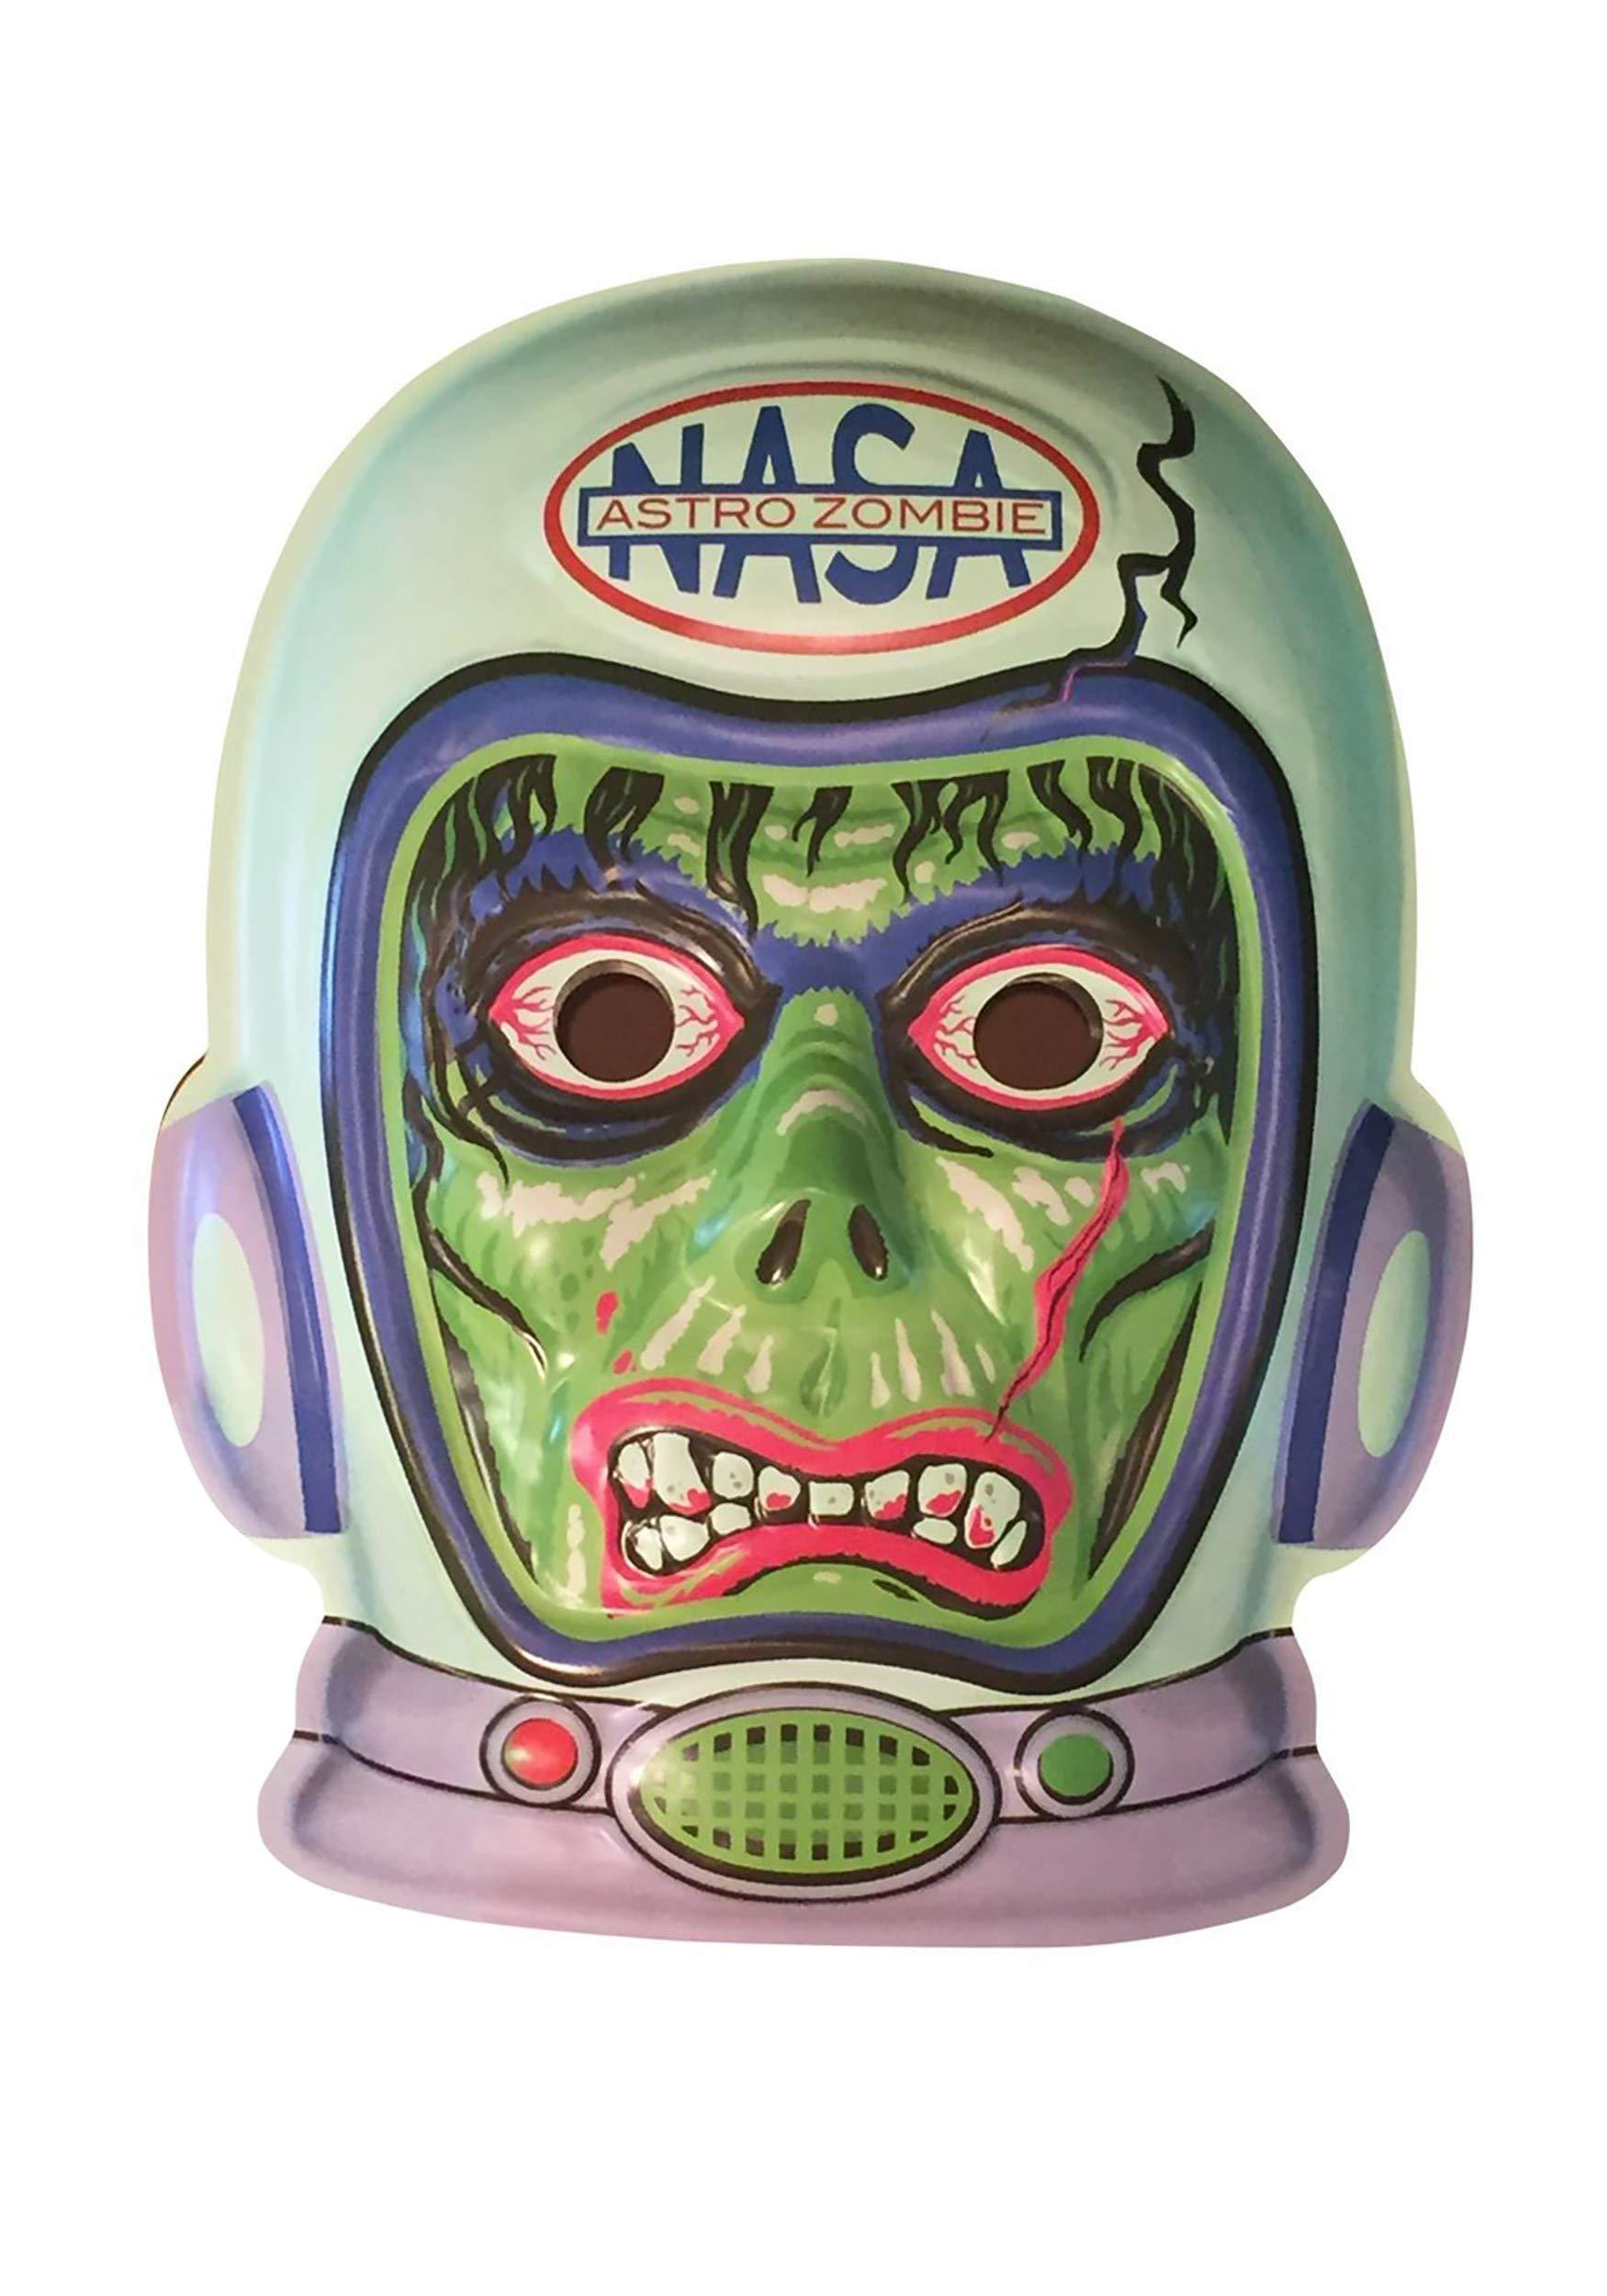 Retro-a-go-go! 4316 Radio Active Astro Zombie VAC-Tactic Plastic Mask Wall Decor by Retro-a-go-go!